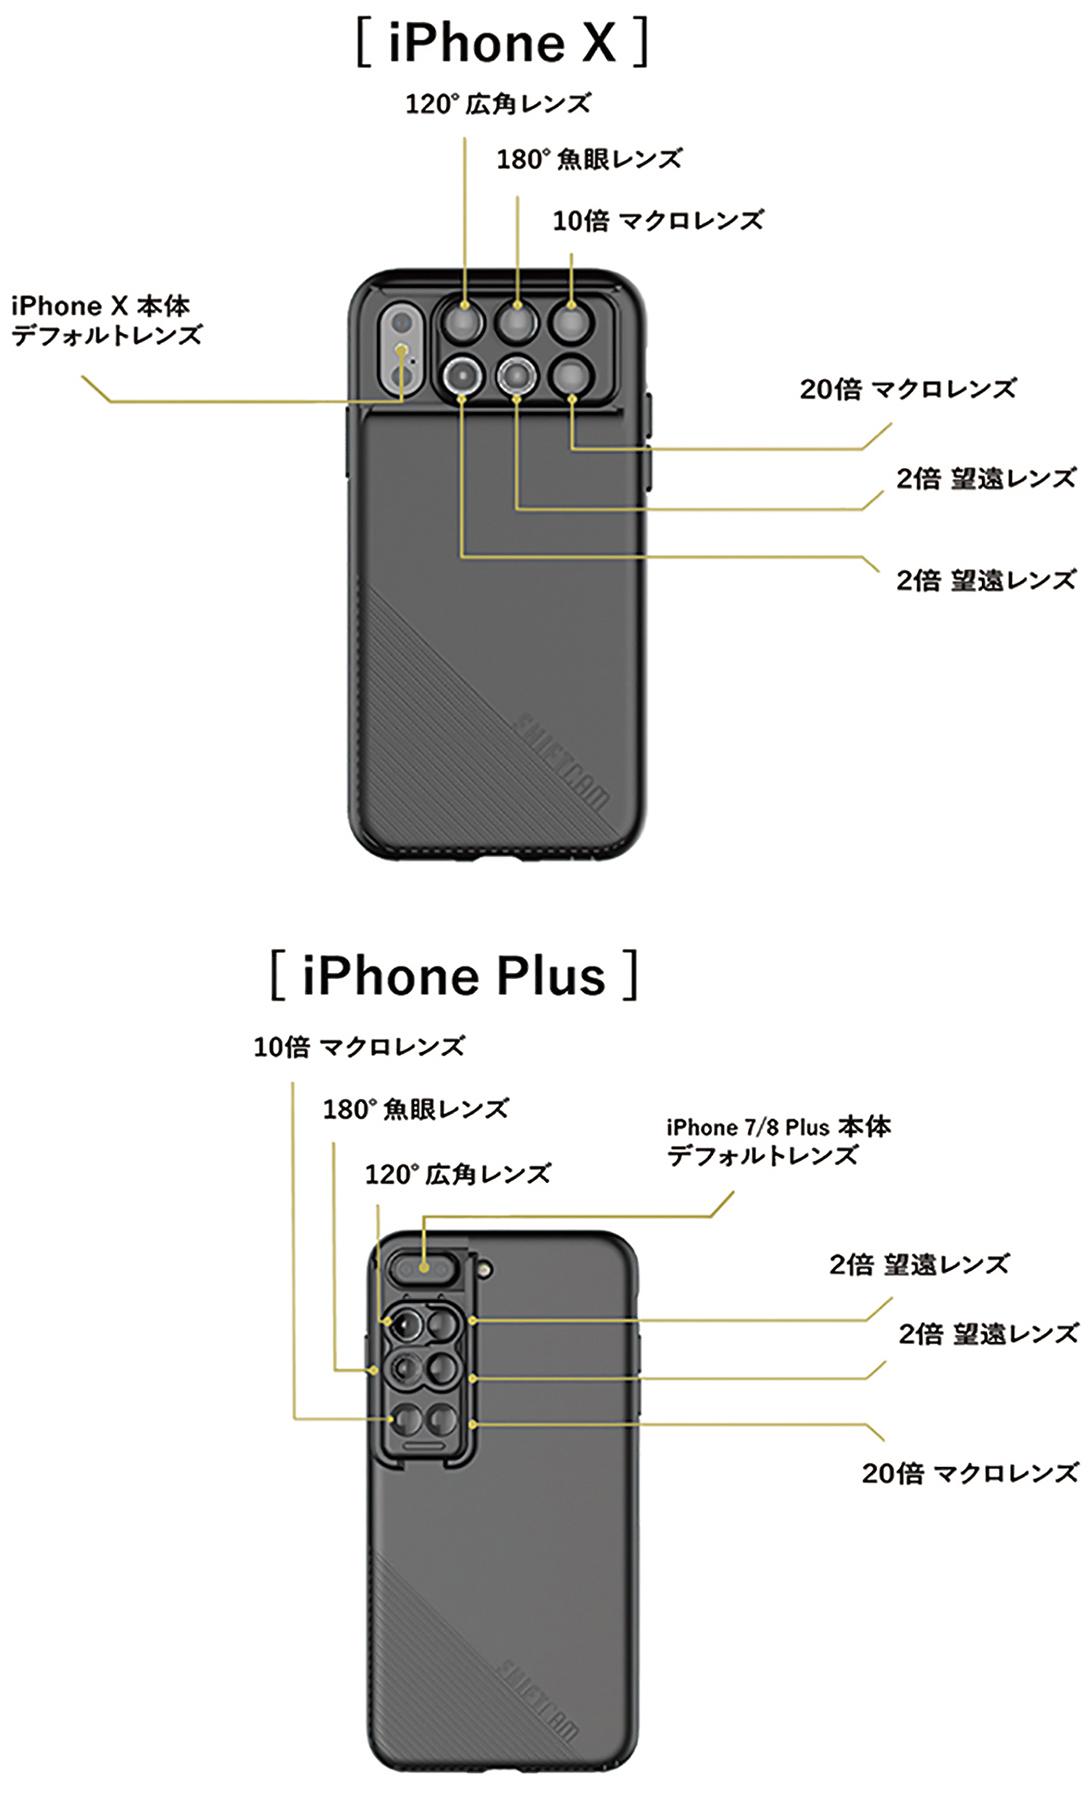 iPhoneX/iPhone7/8plus|一眼レフのような本格撮影を、iPhoneカメラで実現!6種類のレンズ・バッグ付きのコンプリートセット | ShiftCam 2.0